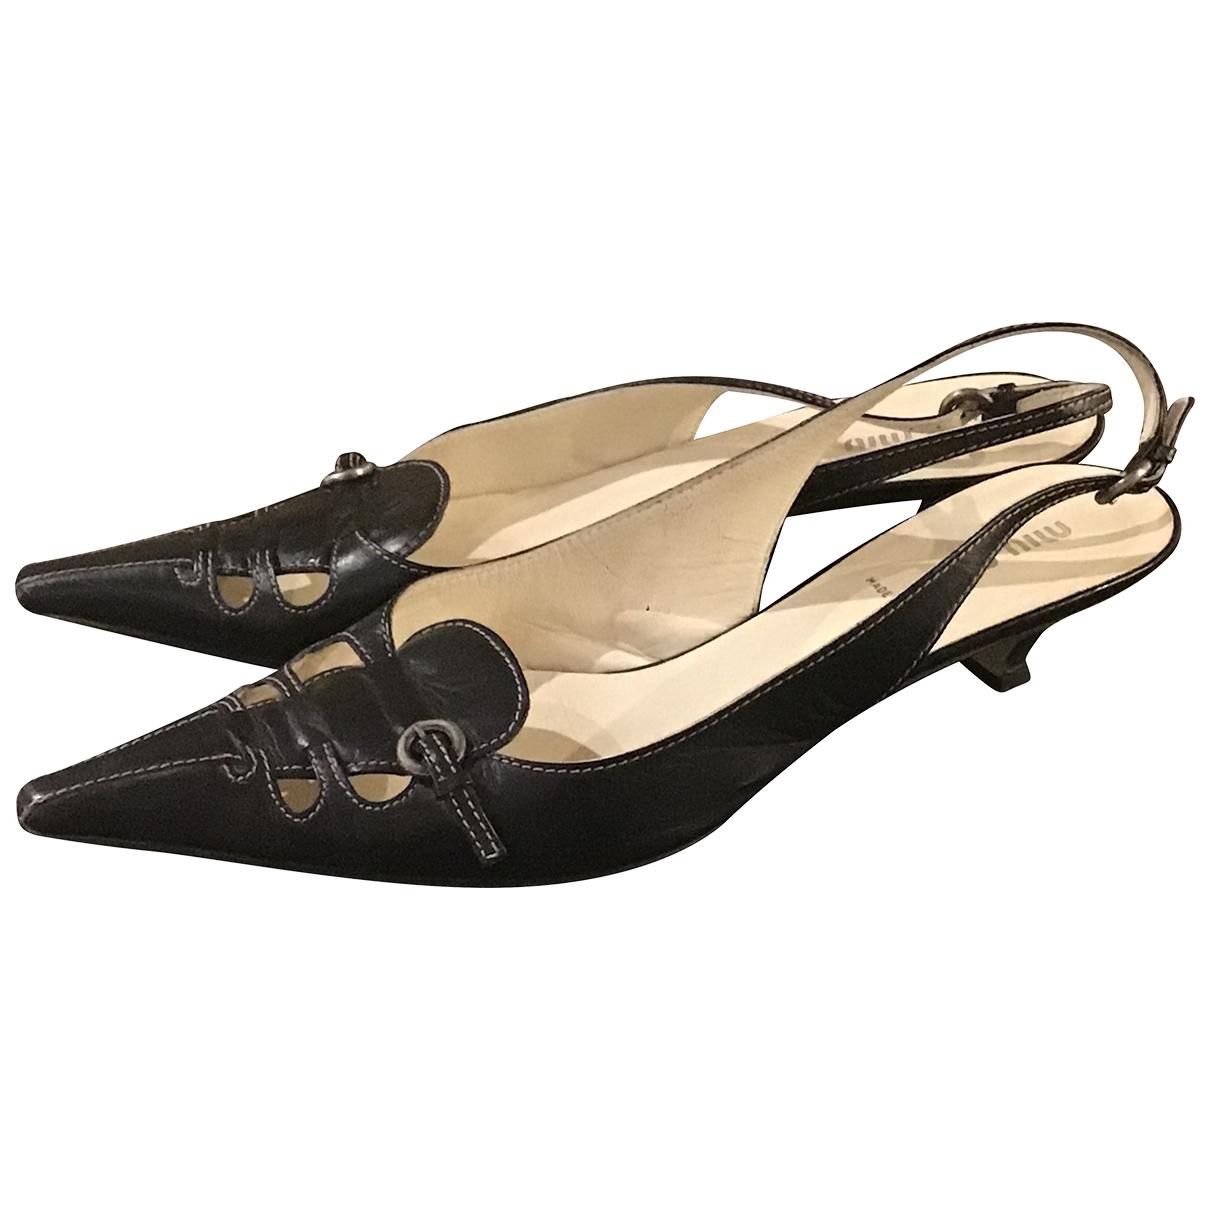 Miu Miu \N Black Leather Heels for Women 38.5 EU